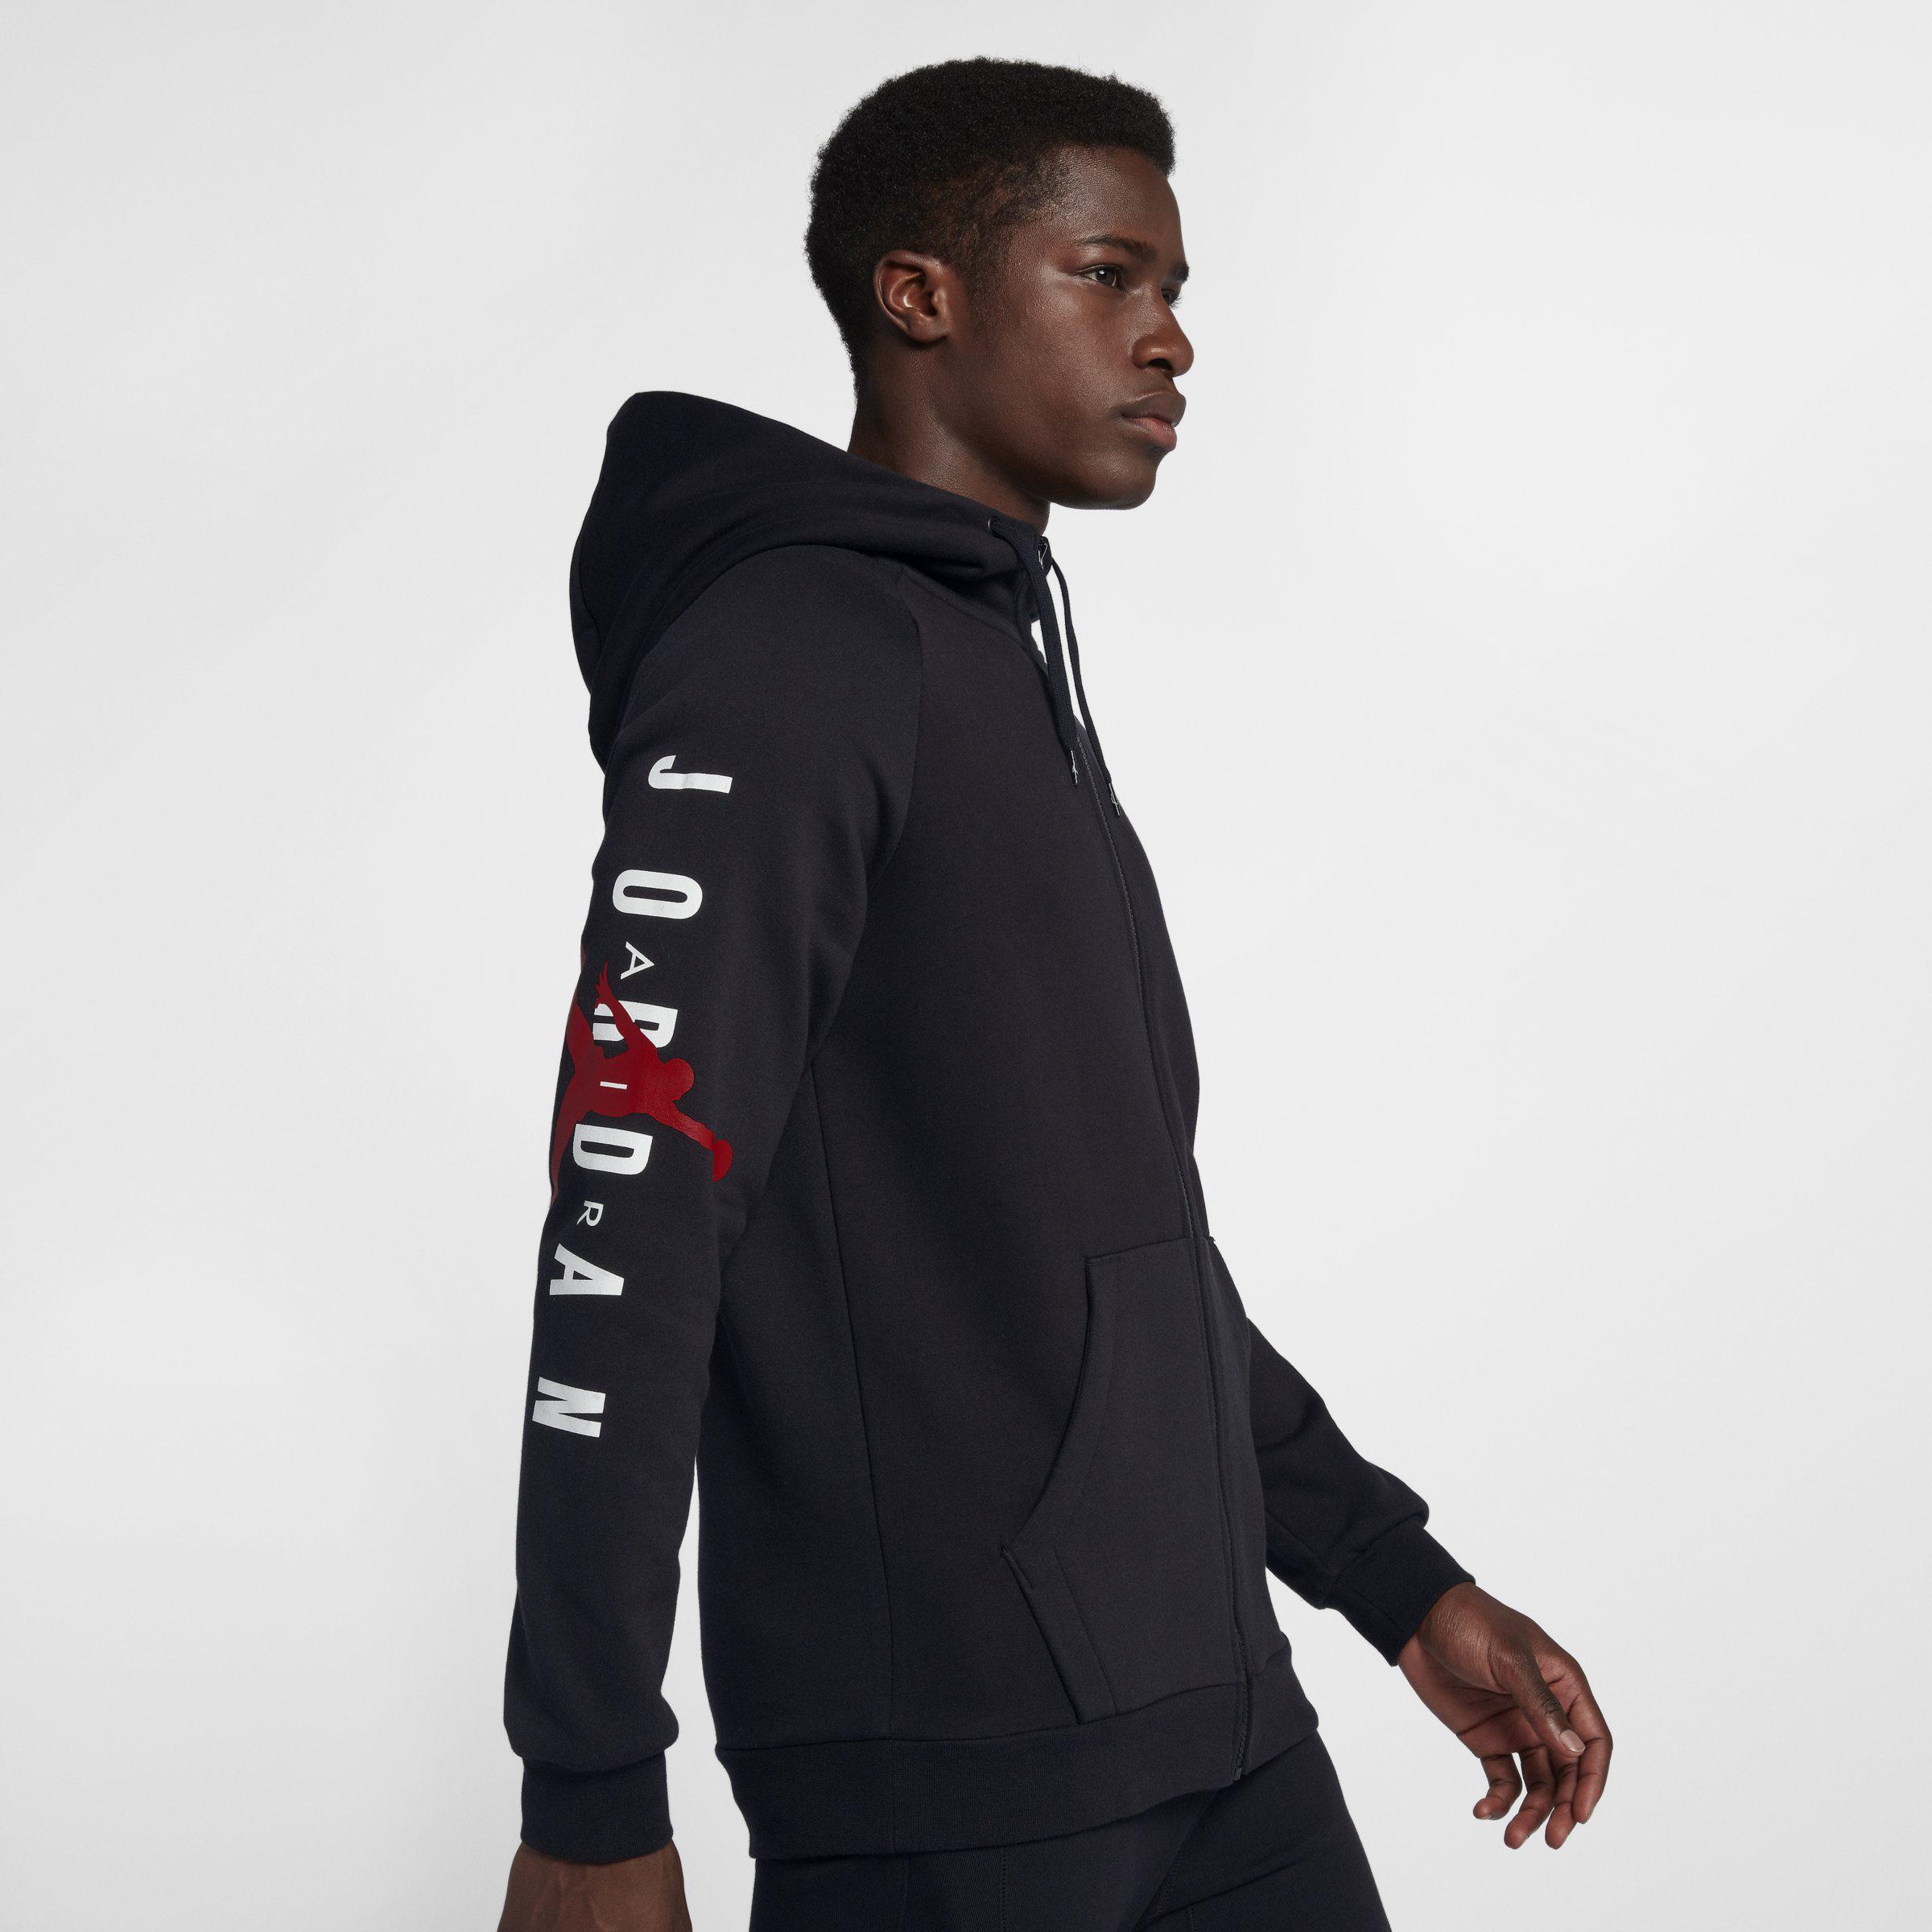 quality design 769d2 95749 Nike Jordan Jumpman Air Fleece Full-zip Hoodie in Black for Men - Lyst